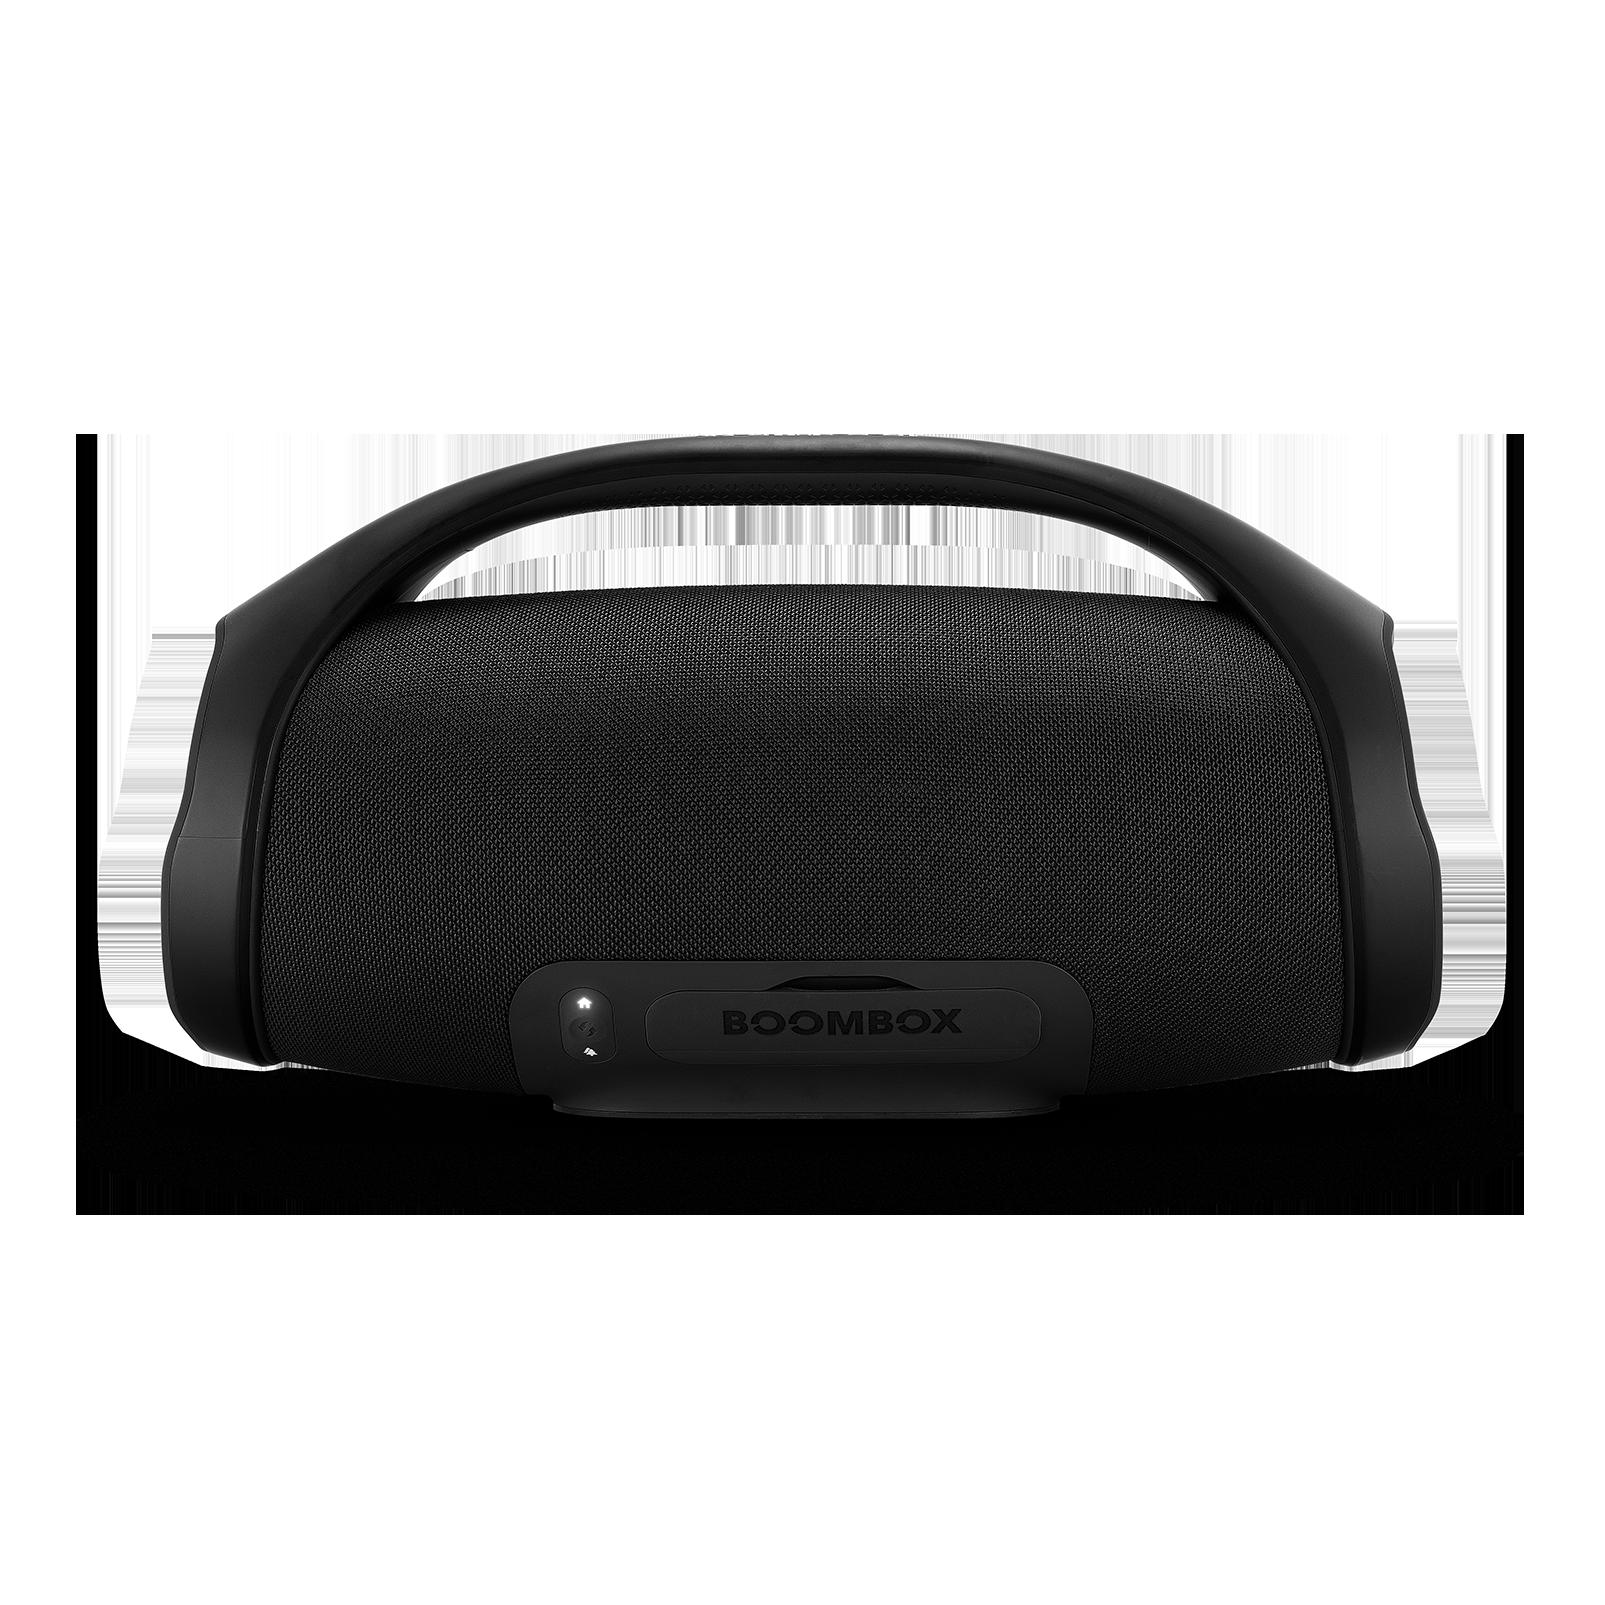 JBL Boombox - Black - Portable Bluetooth Speaker - Back